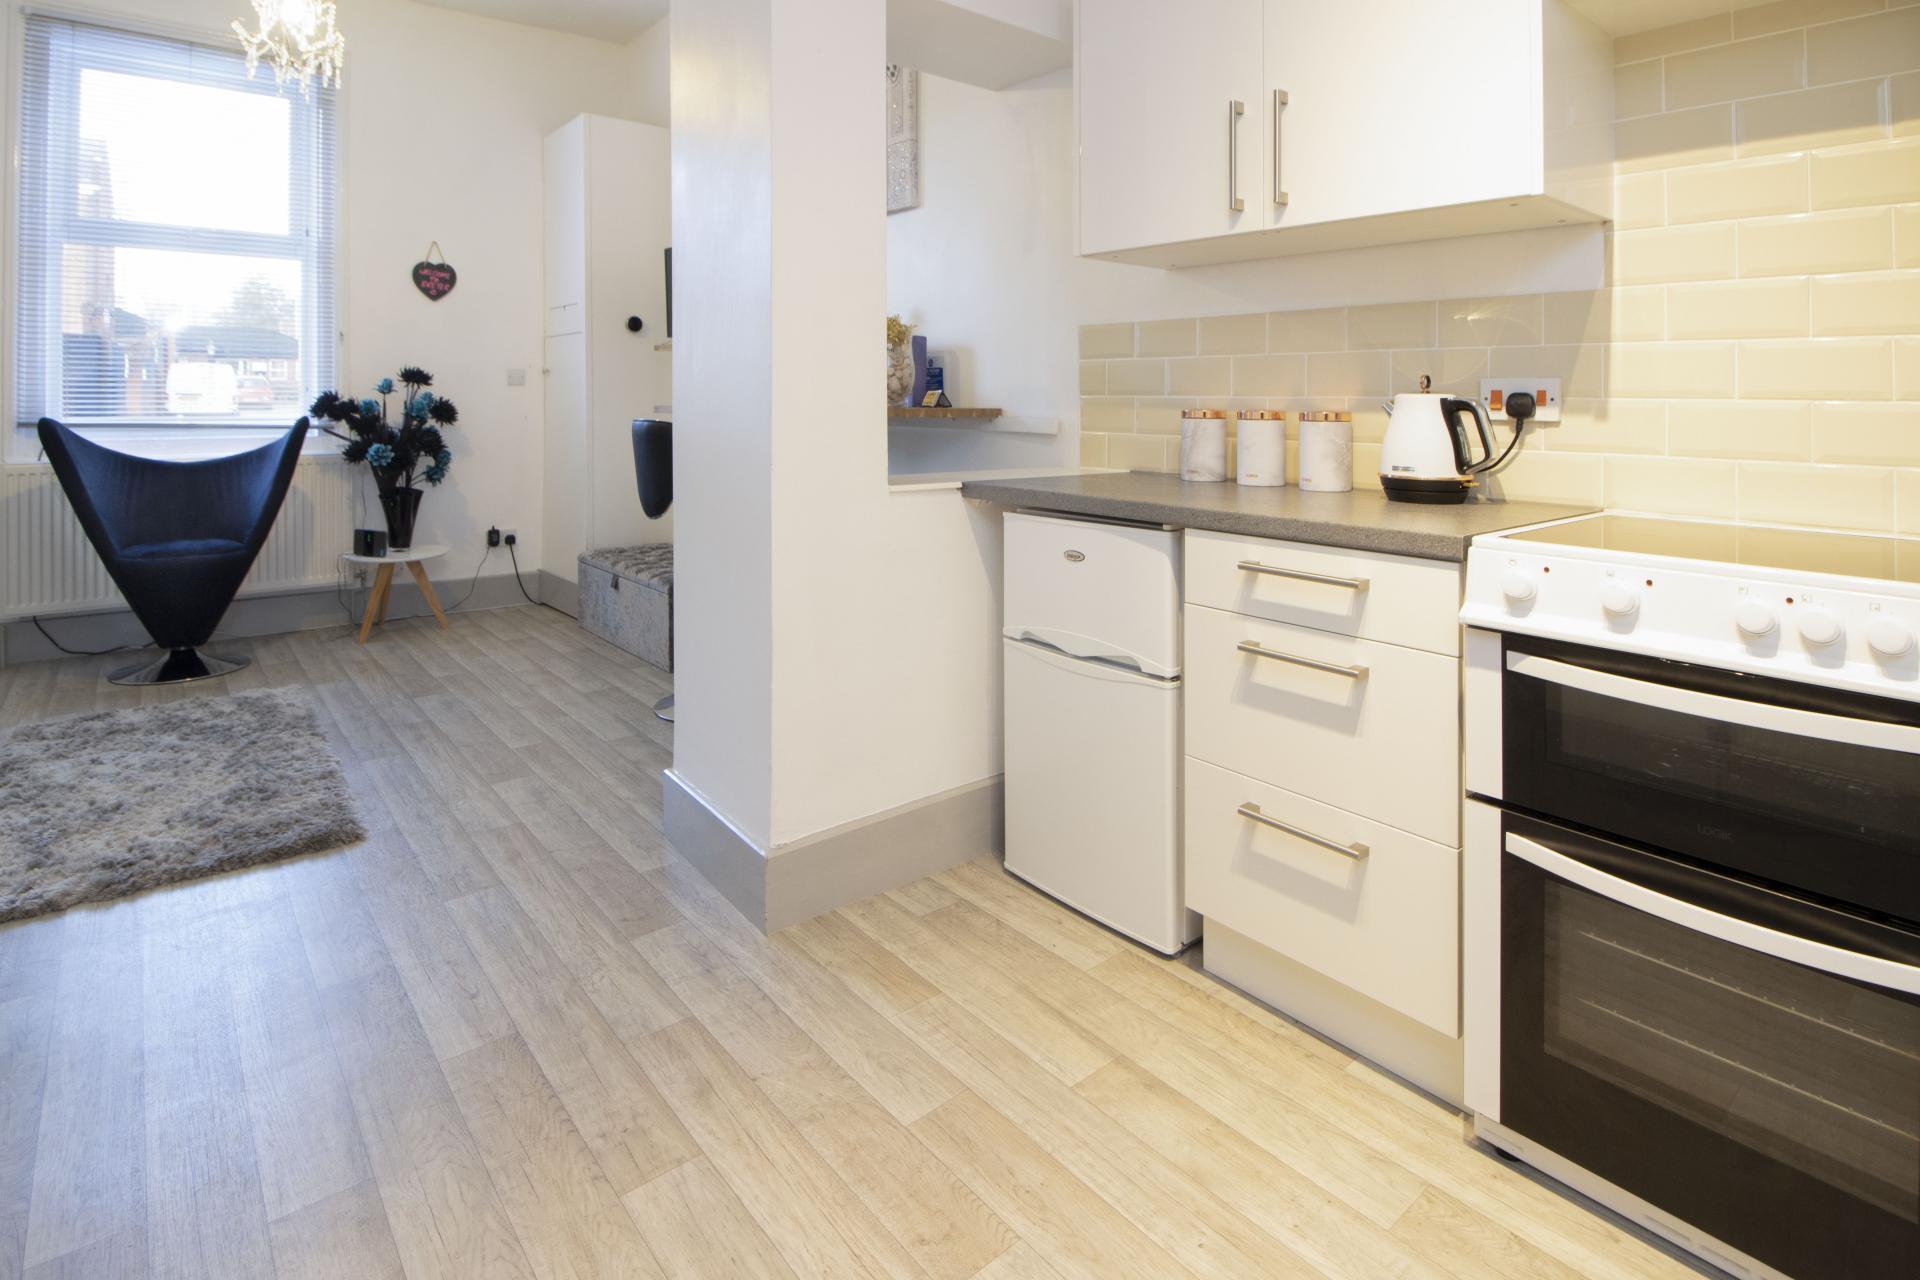 Oven at Kimberley Road Apartment - Citybase Apartments